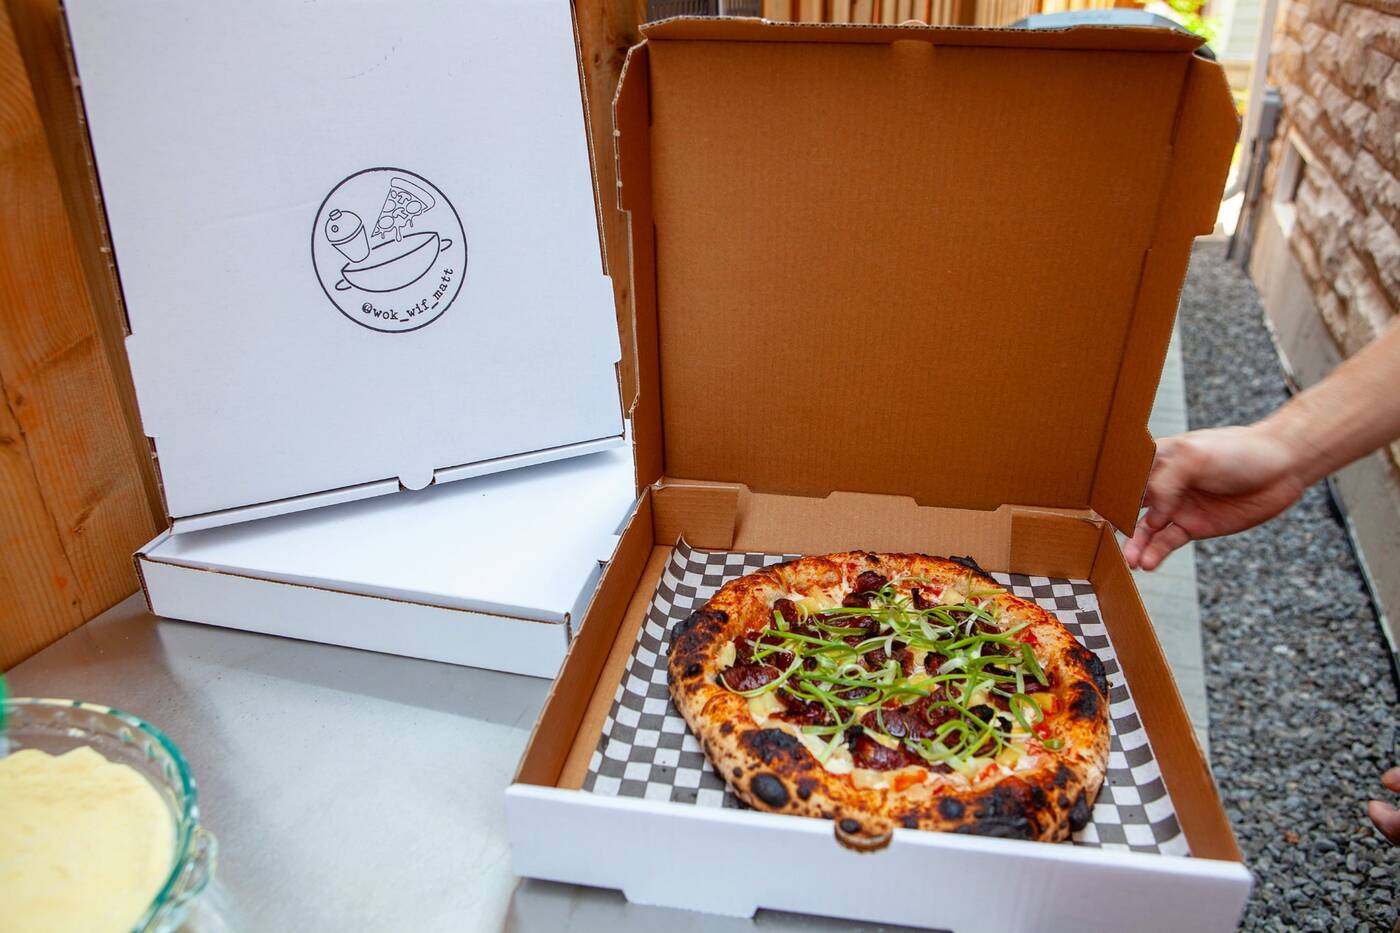 alleyway pizza